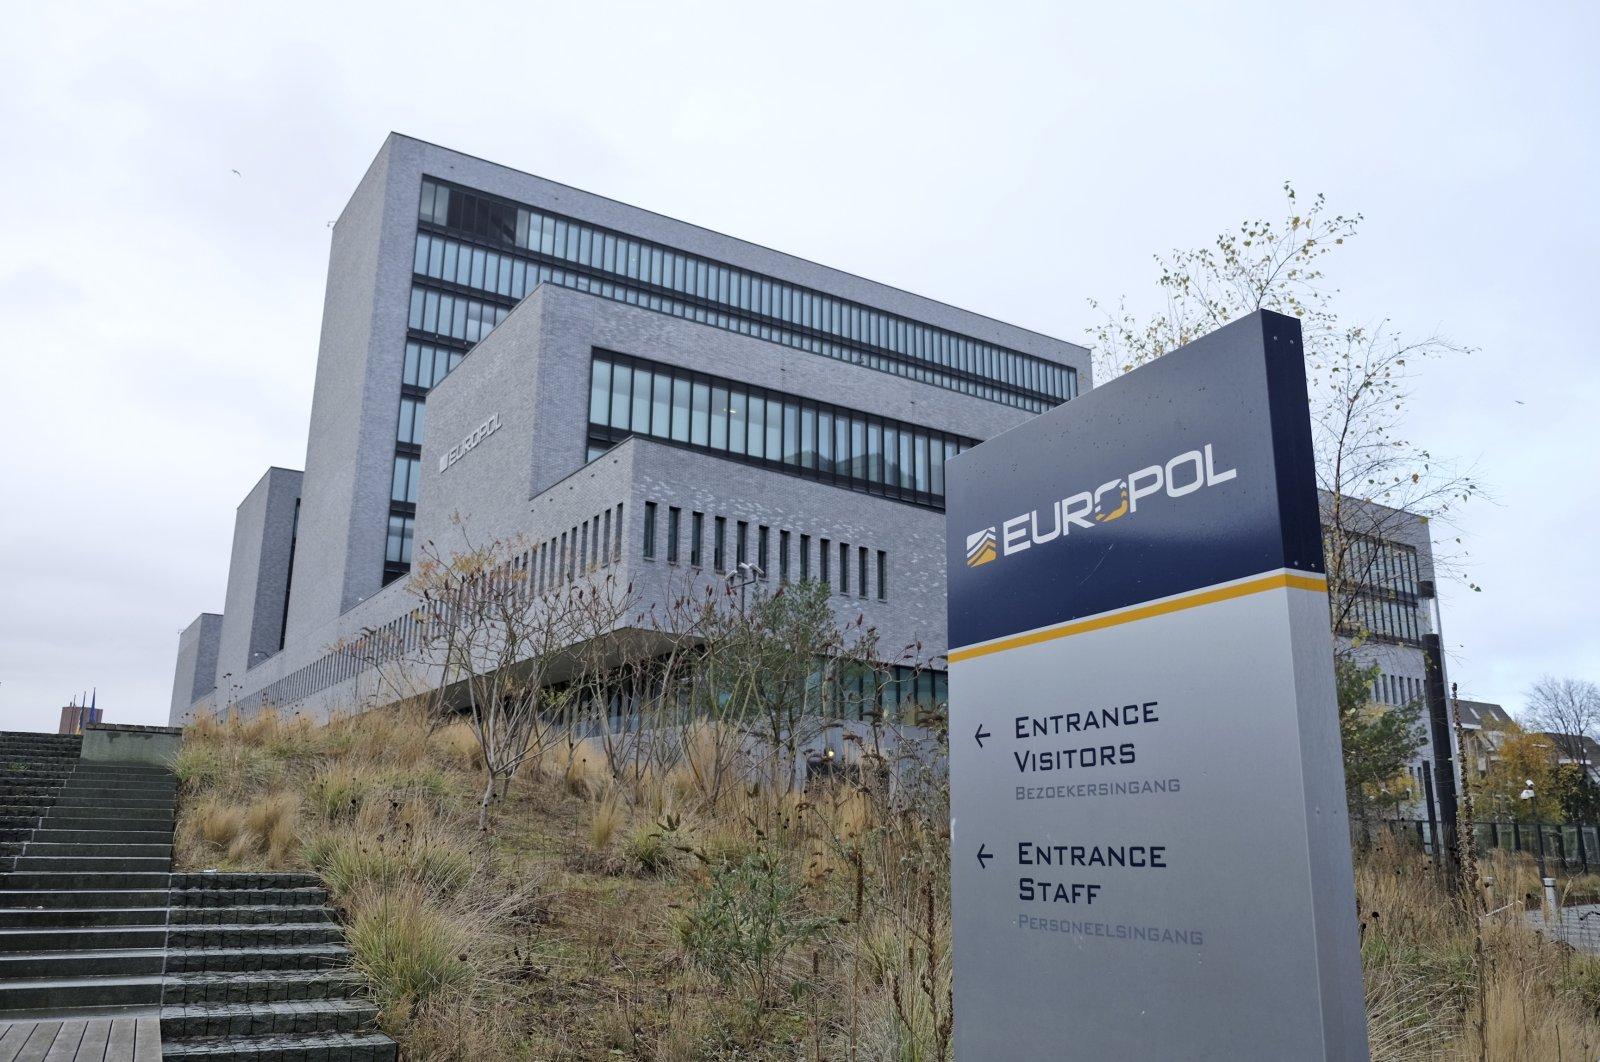 Europol headquarters in The Hague, Netherlands, Dec. 2, 2016. (AP Photo)